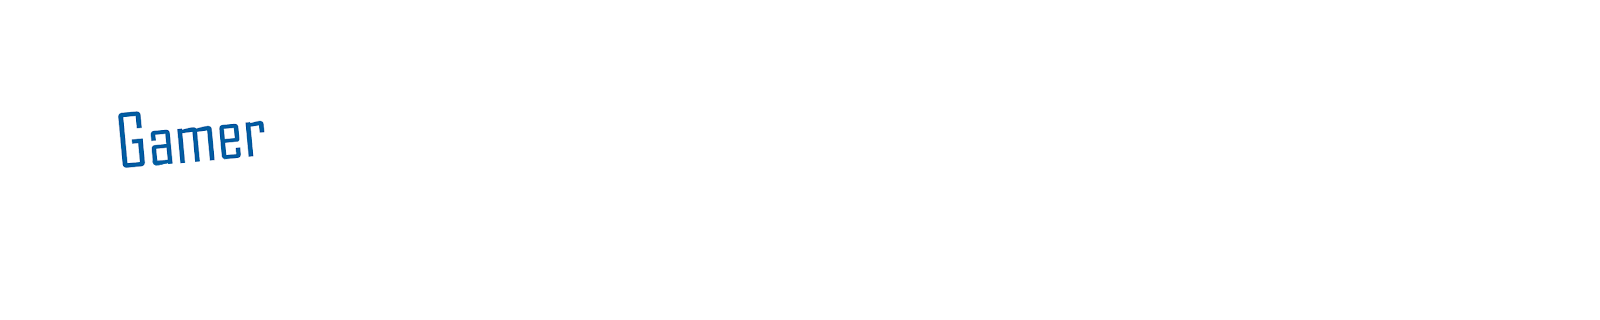 Ilham Labib M